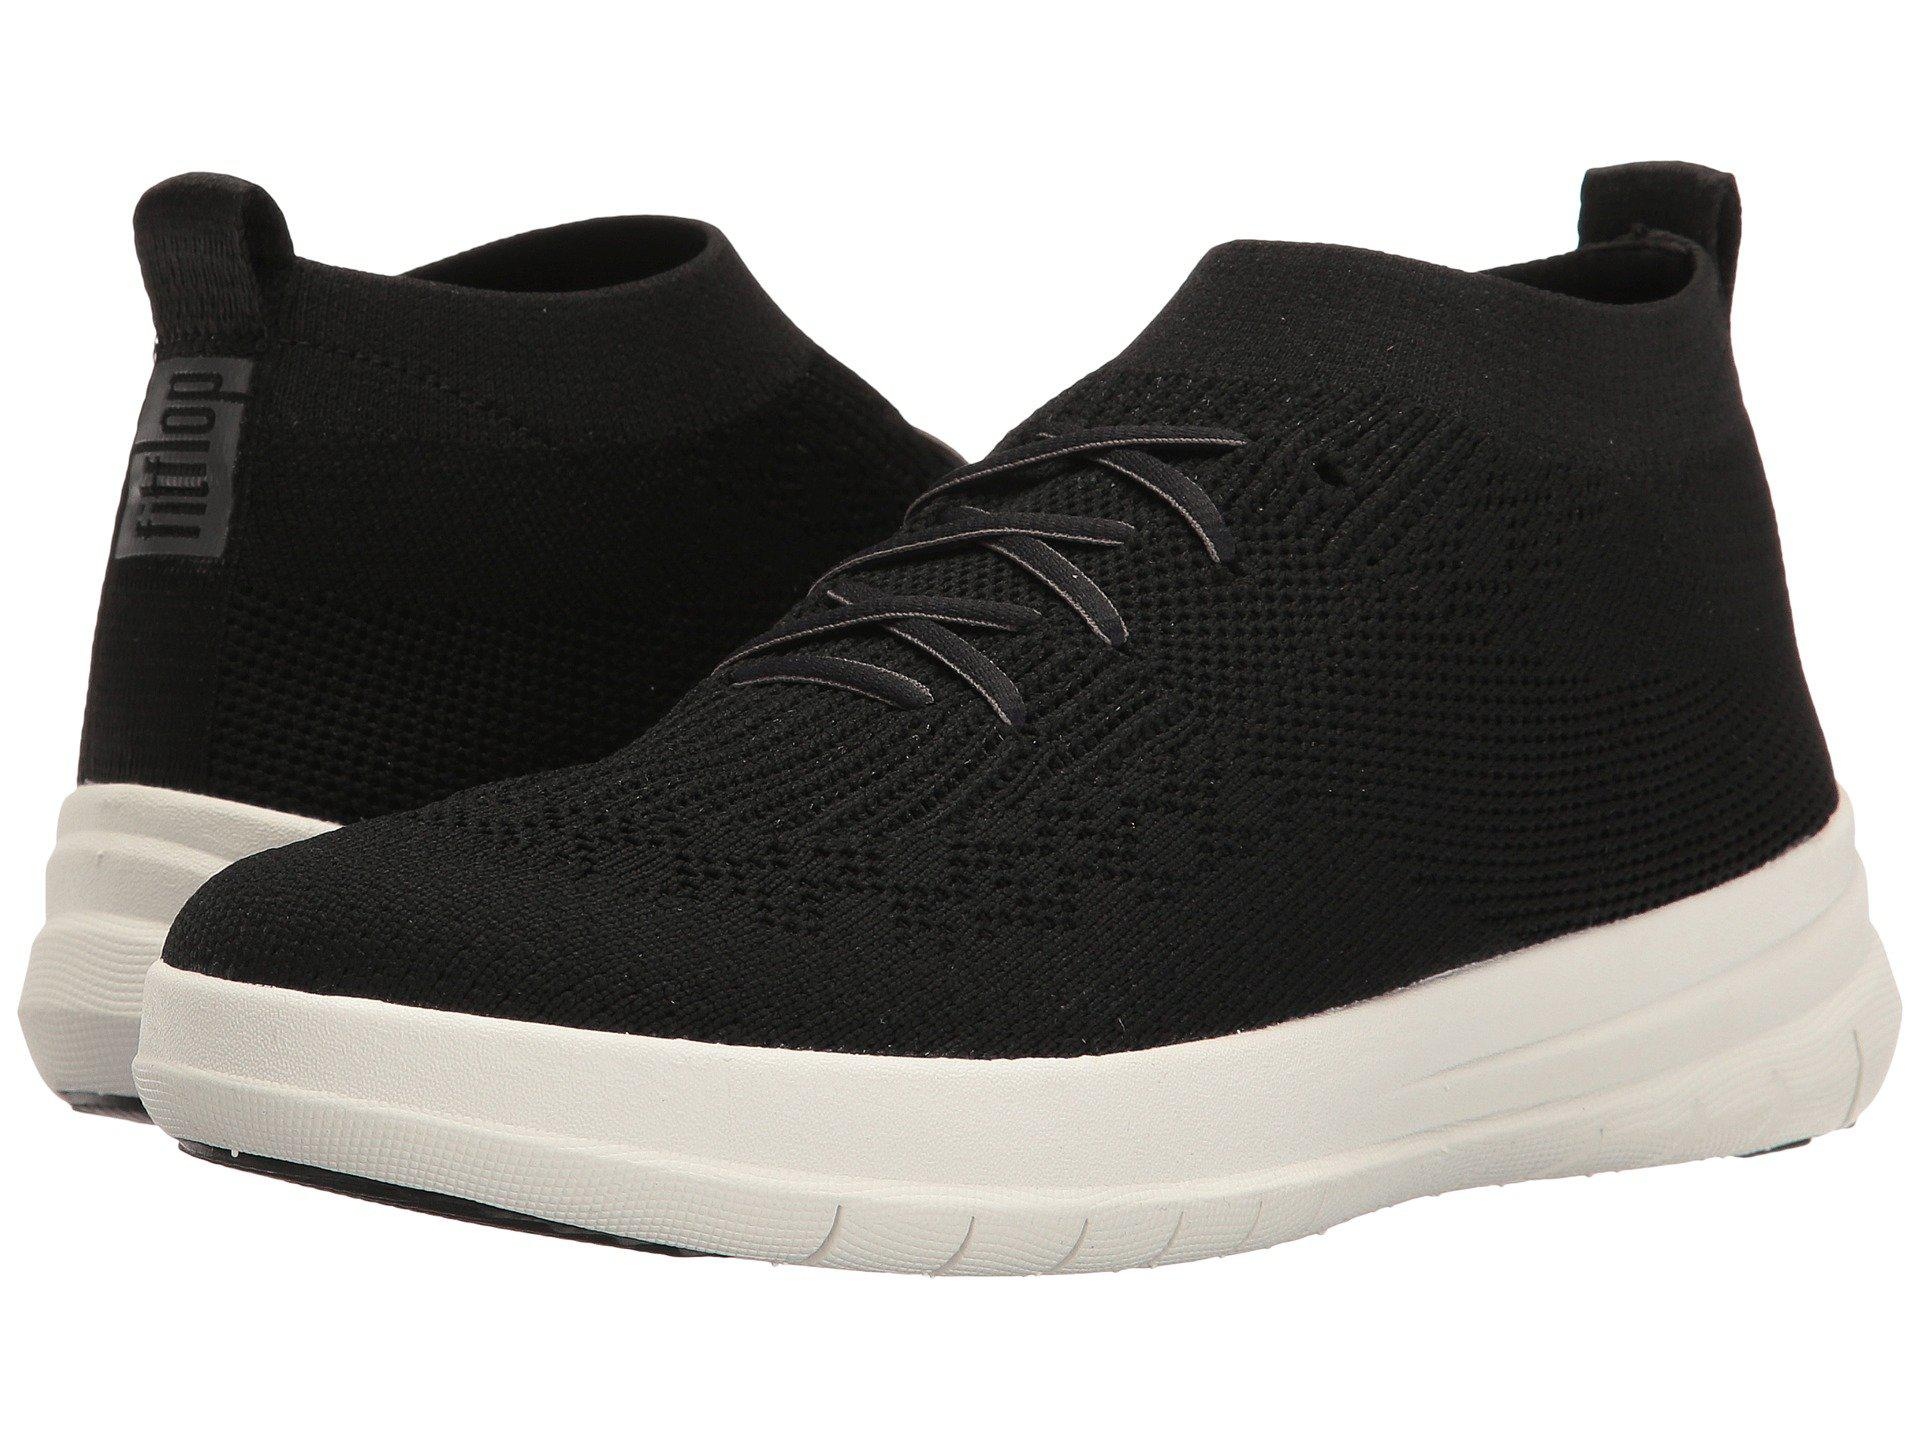 Fitflop Uberknit Slip On High Top Sneaker In Black For Men